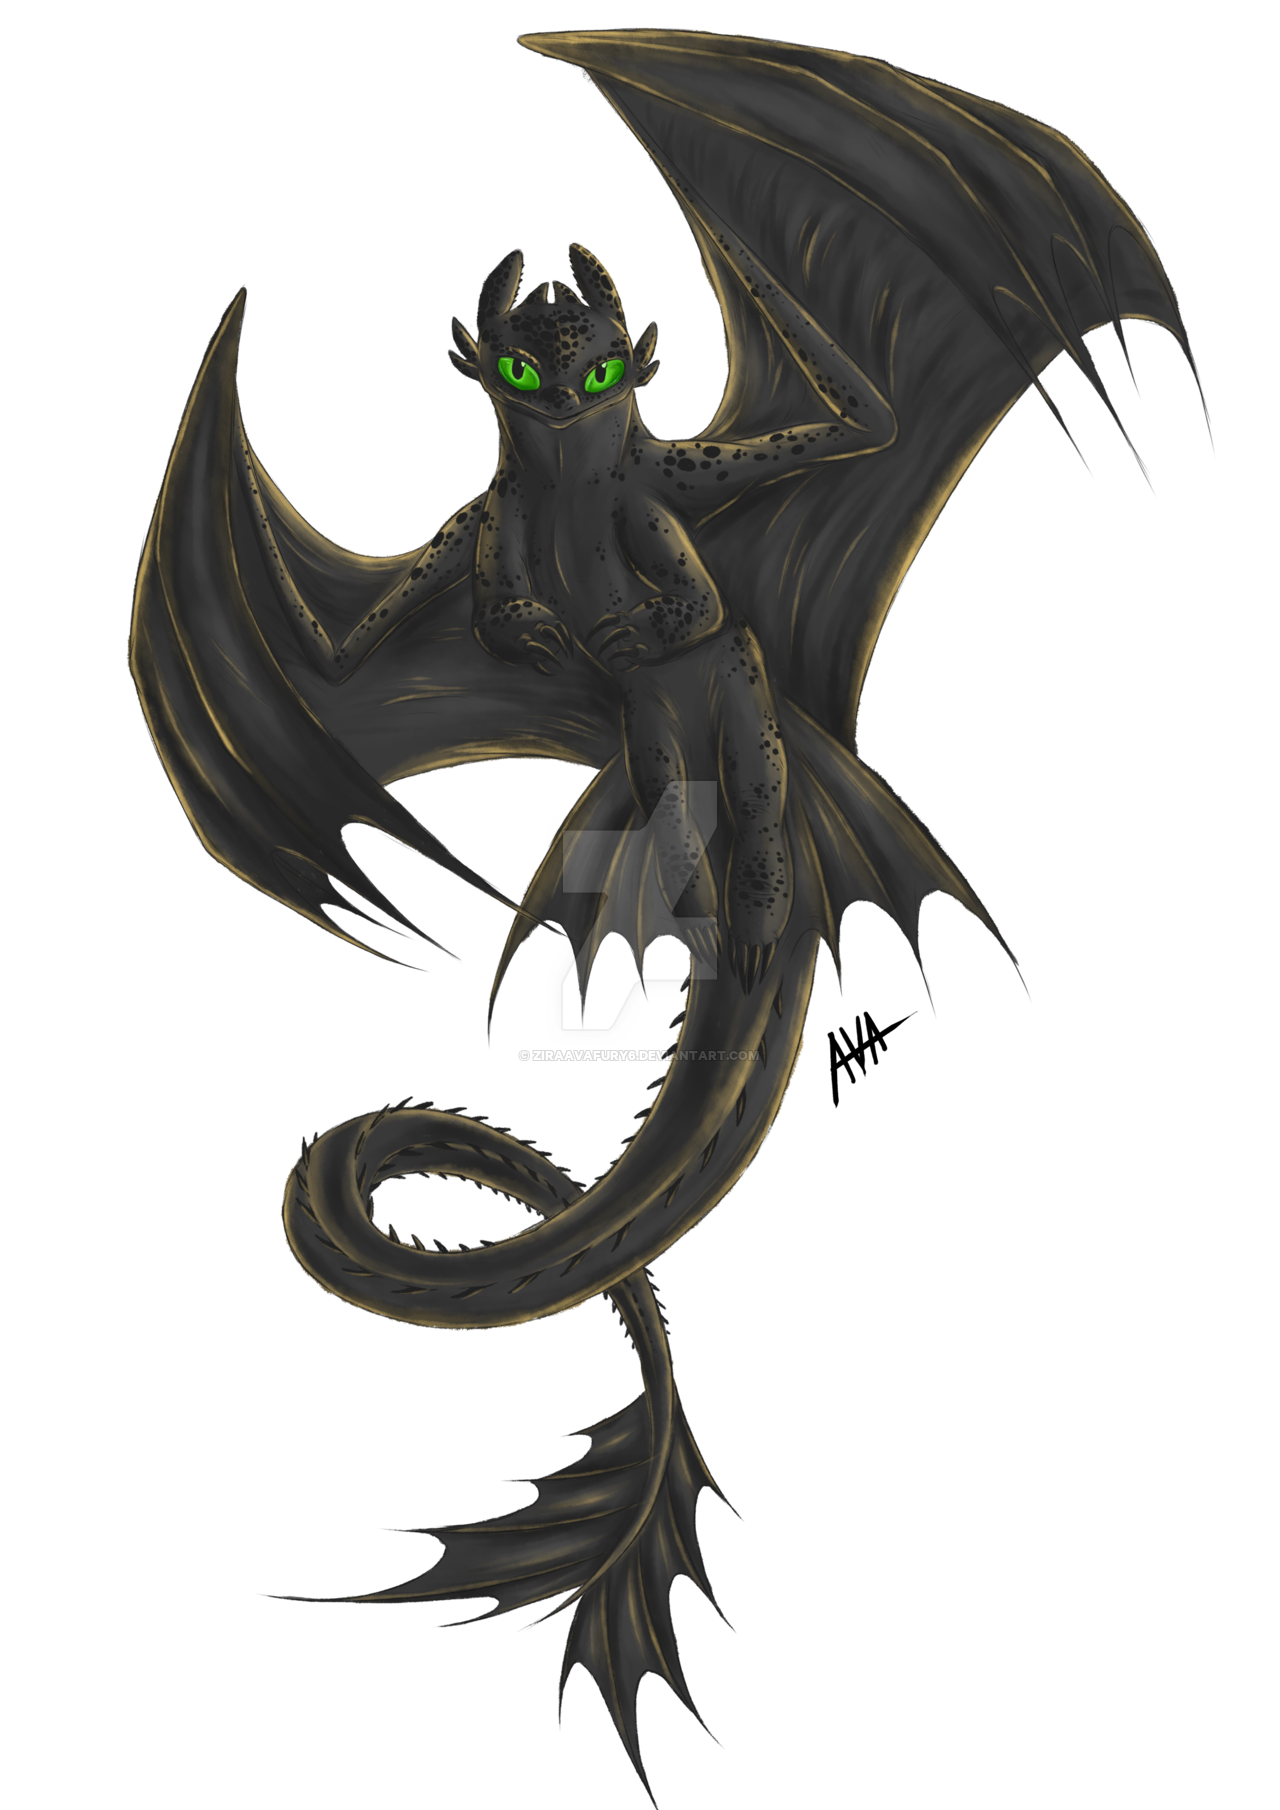 Https www howtotrainyourdragon com. Dragon clipart fierce dragon